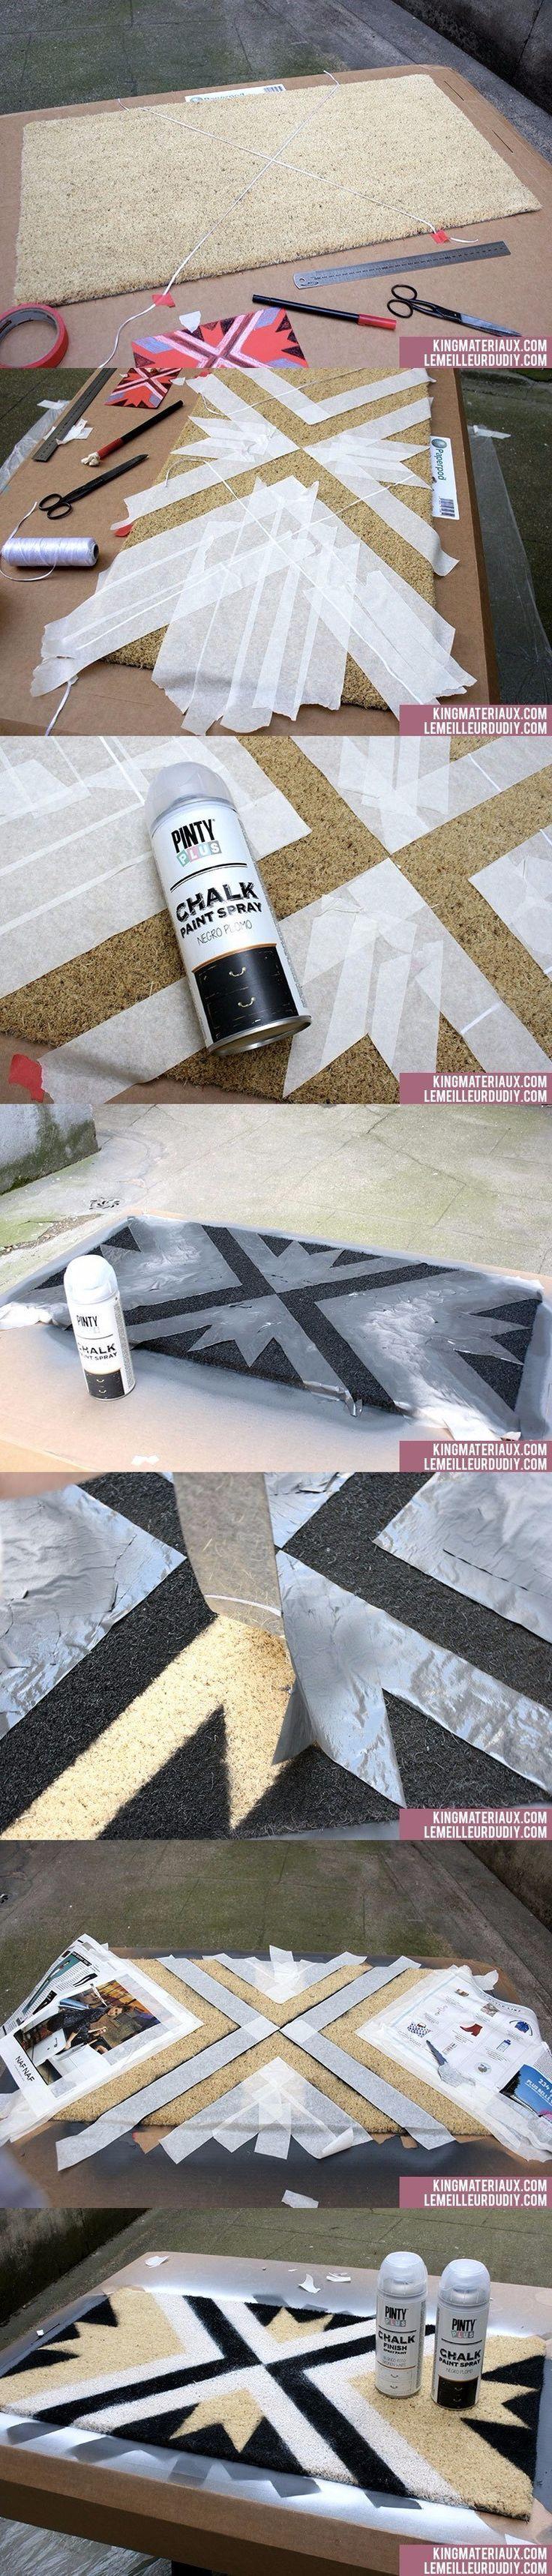 Tapete pintado con diseño geométrico - lemeilleurdudiy.com - DIY Painted Doormat